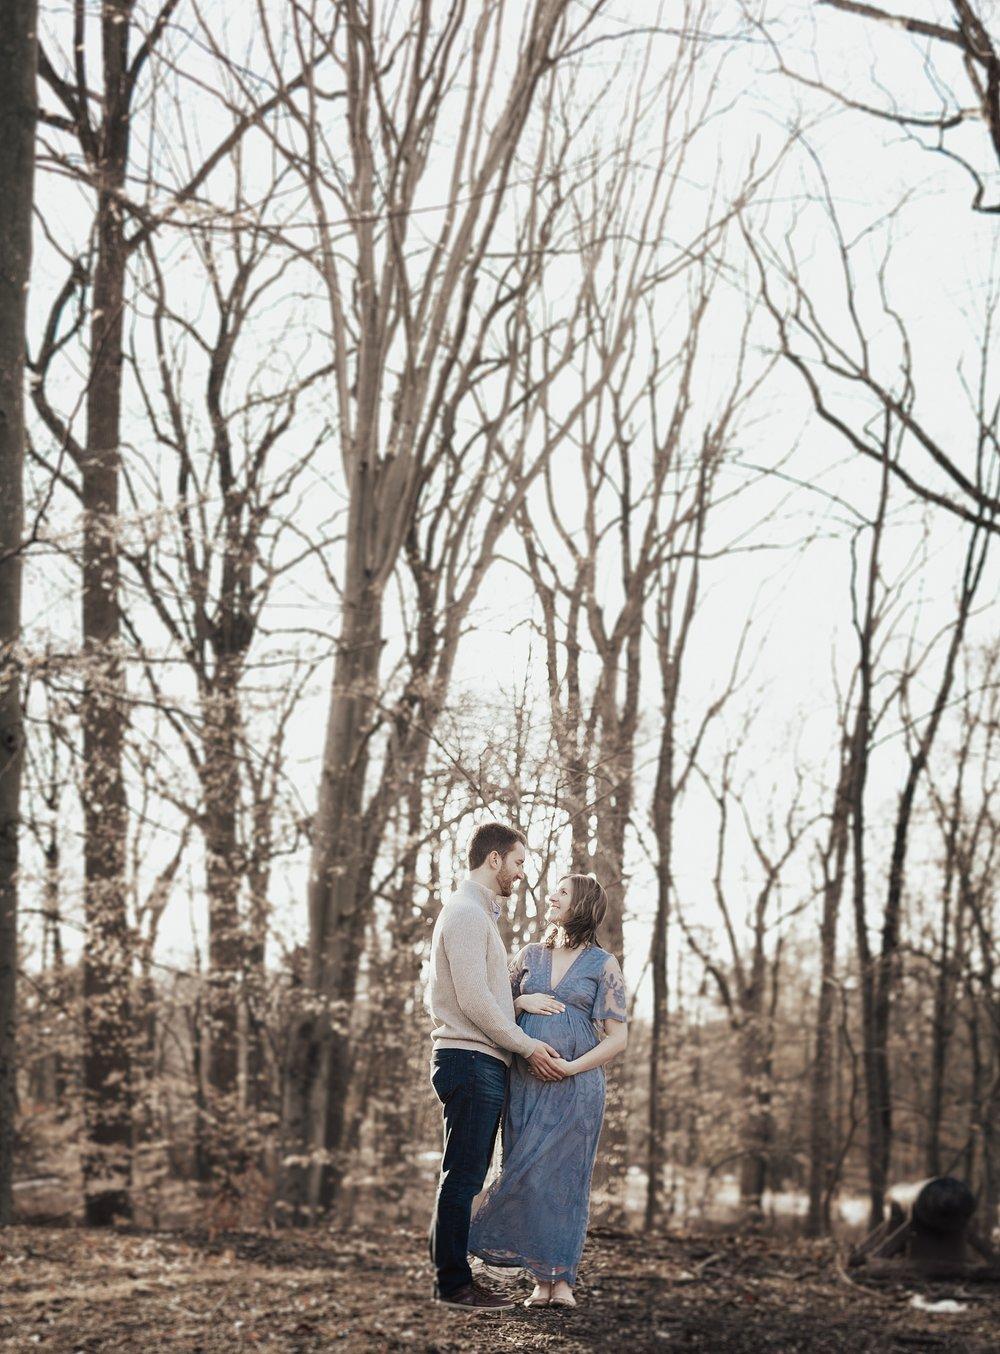 Joe_Mac_Creative_Maternity_Wedding_Engagements_Photography_Philadelphia_Valley_Forge__0034.jpg